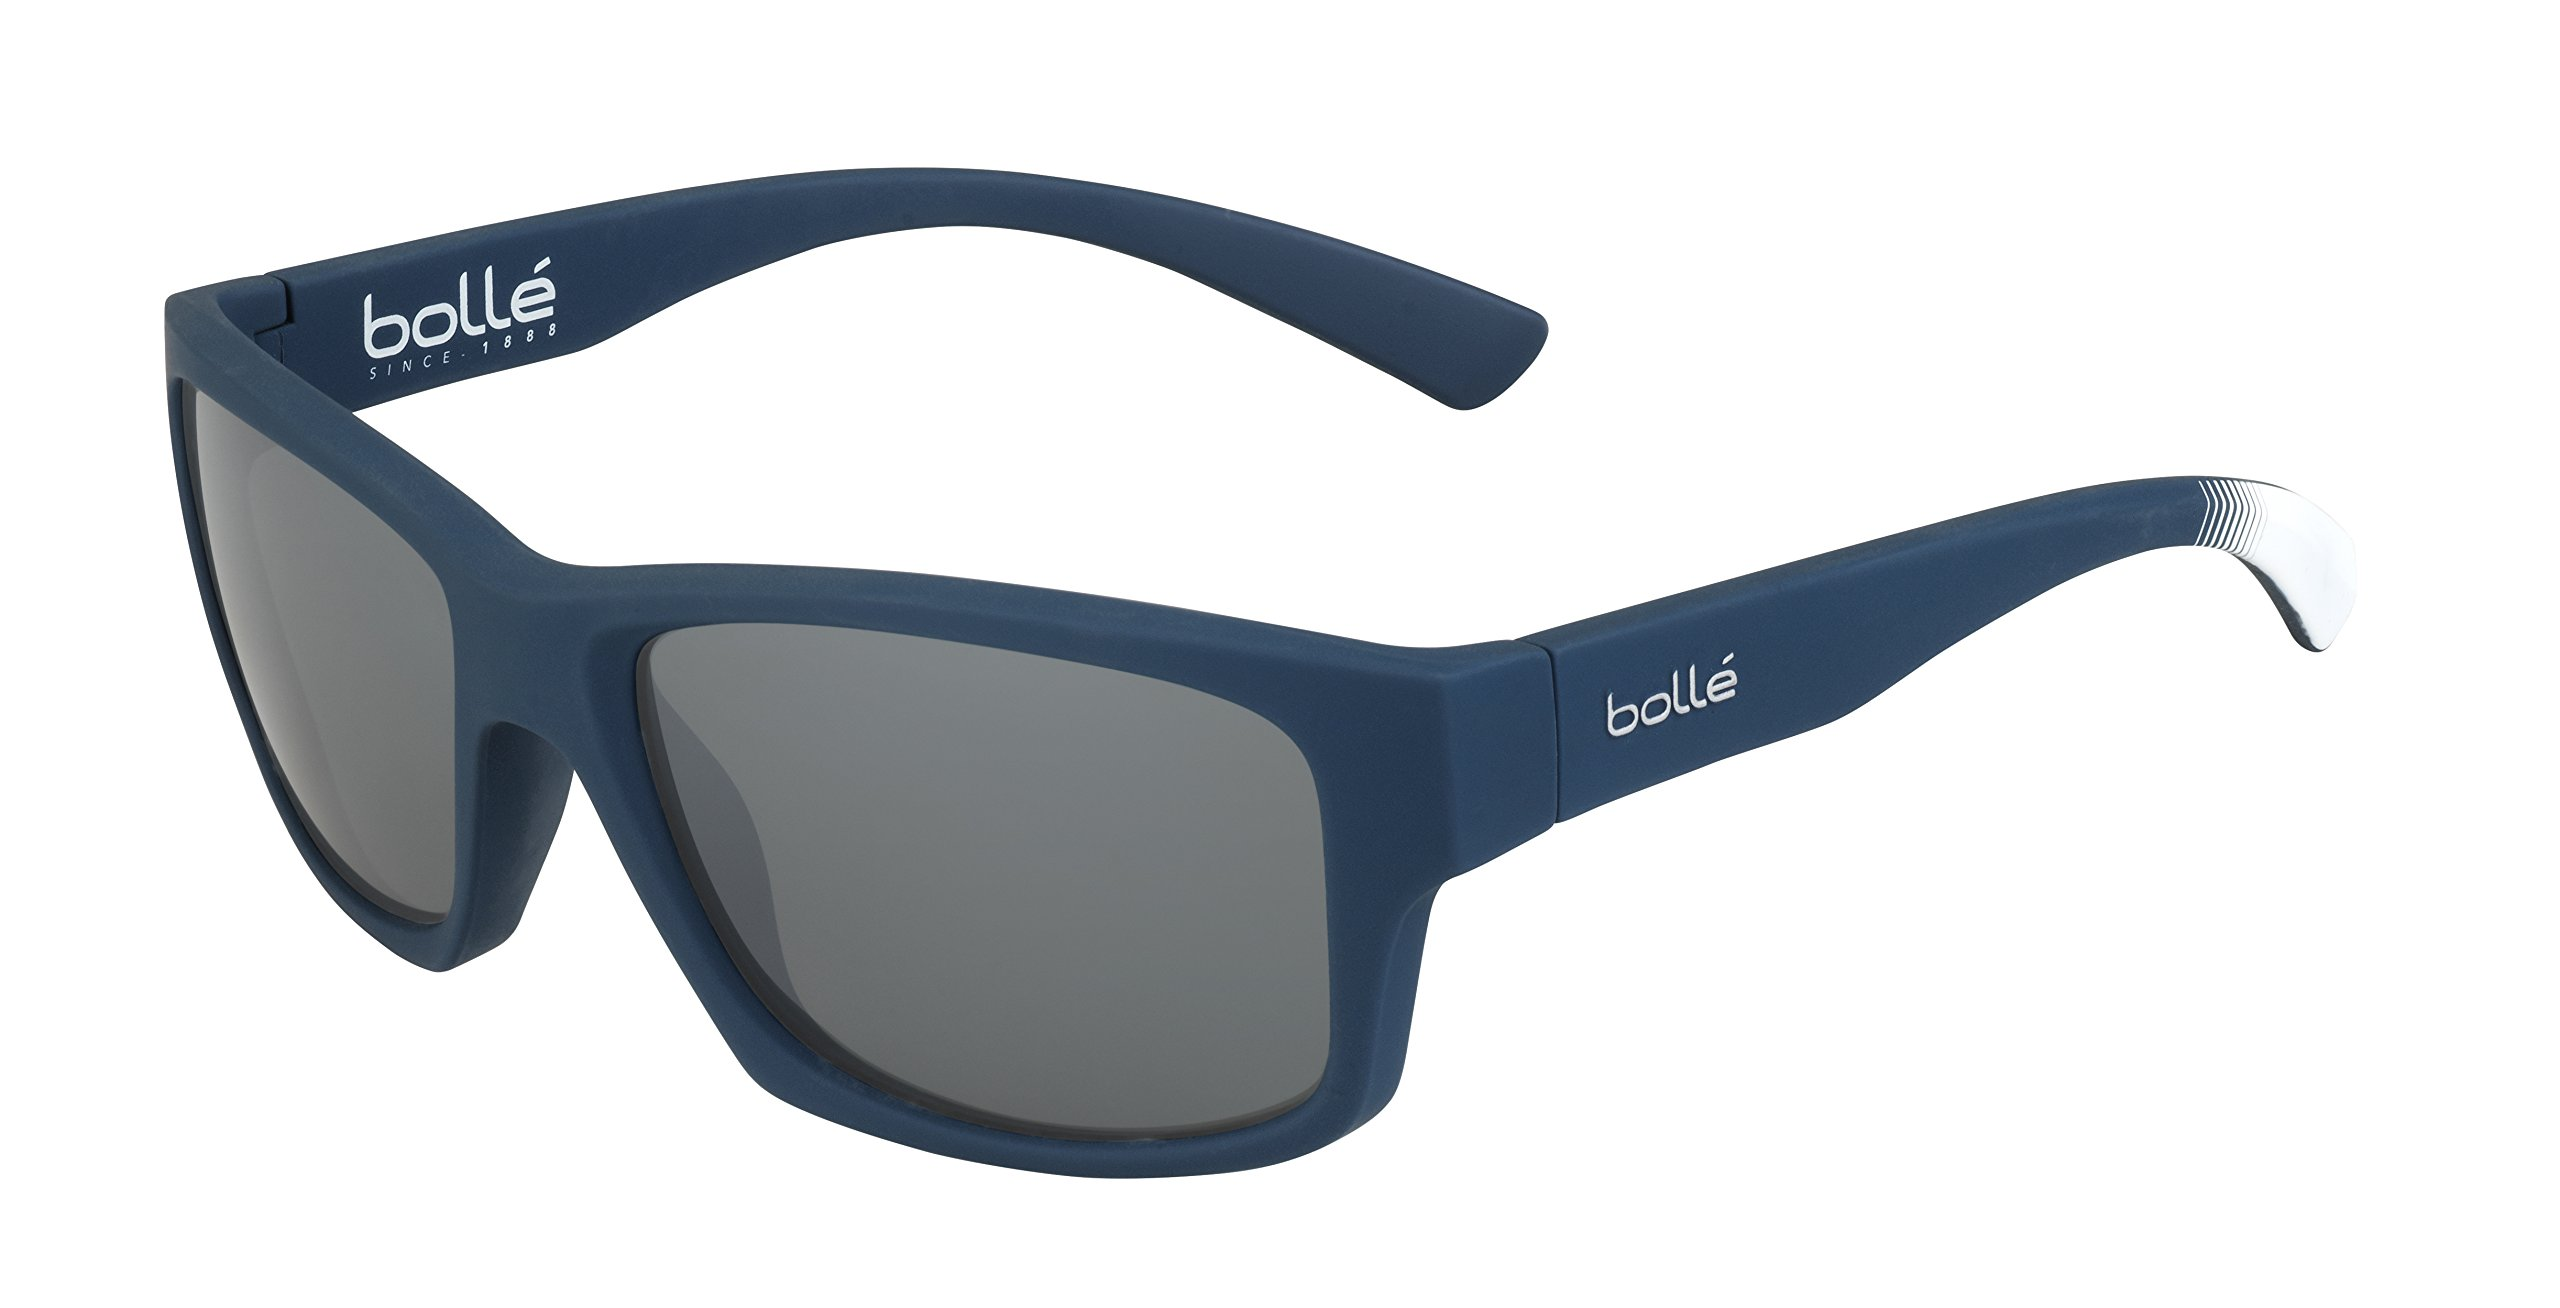 297d536796 bollé Holman Gafas, Unisex Adulto - Hombre Moderno